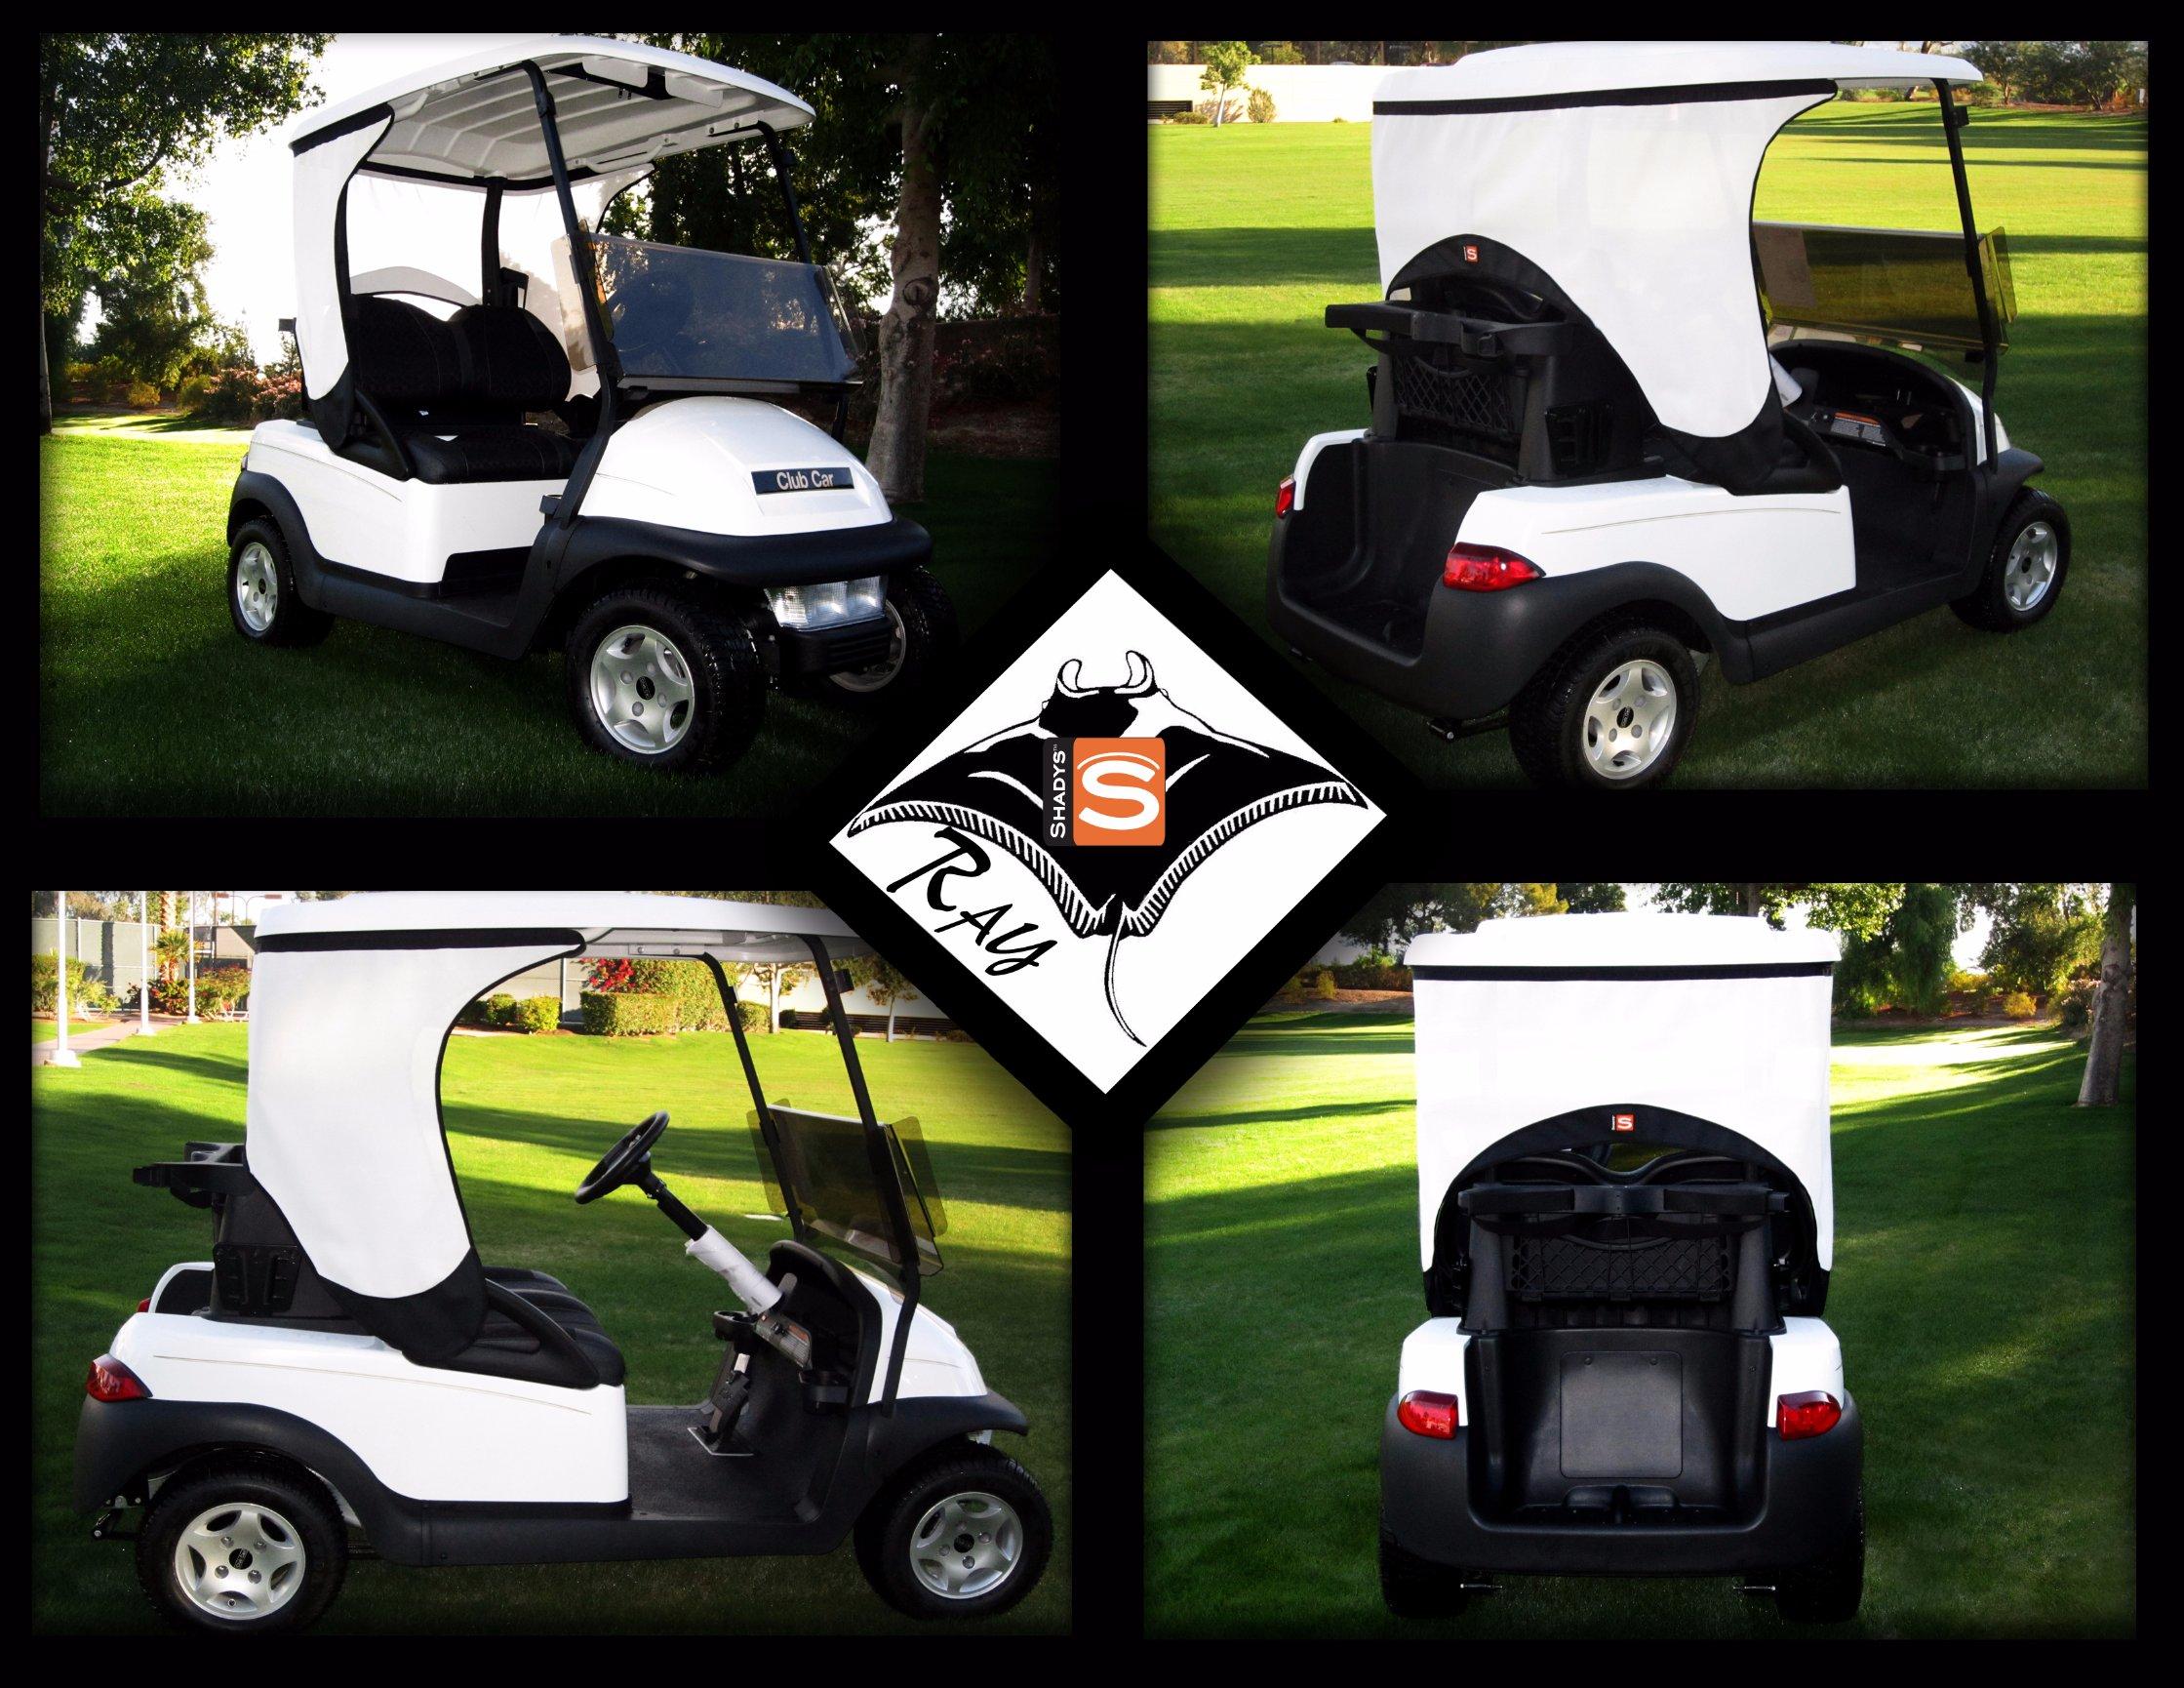 Home - Shady's - The Ultimate In Golf Cart Shade & UV Protection Golf Cart Shade Structure on golf players, golf games, golf hitting nets, golf words, golf handicap, golf tools, golf card, golf girls, golf buggy, golf machine, golf trolley, golf cartoons, golf accessories,